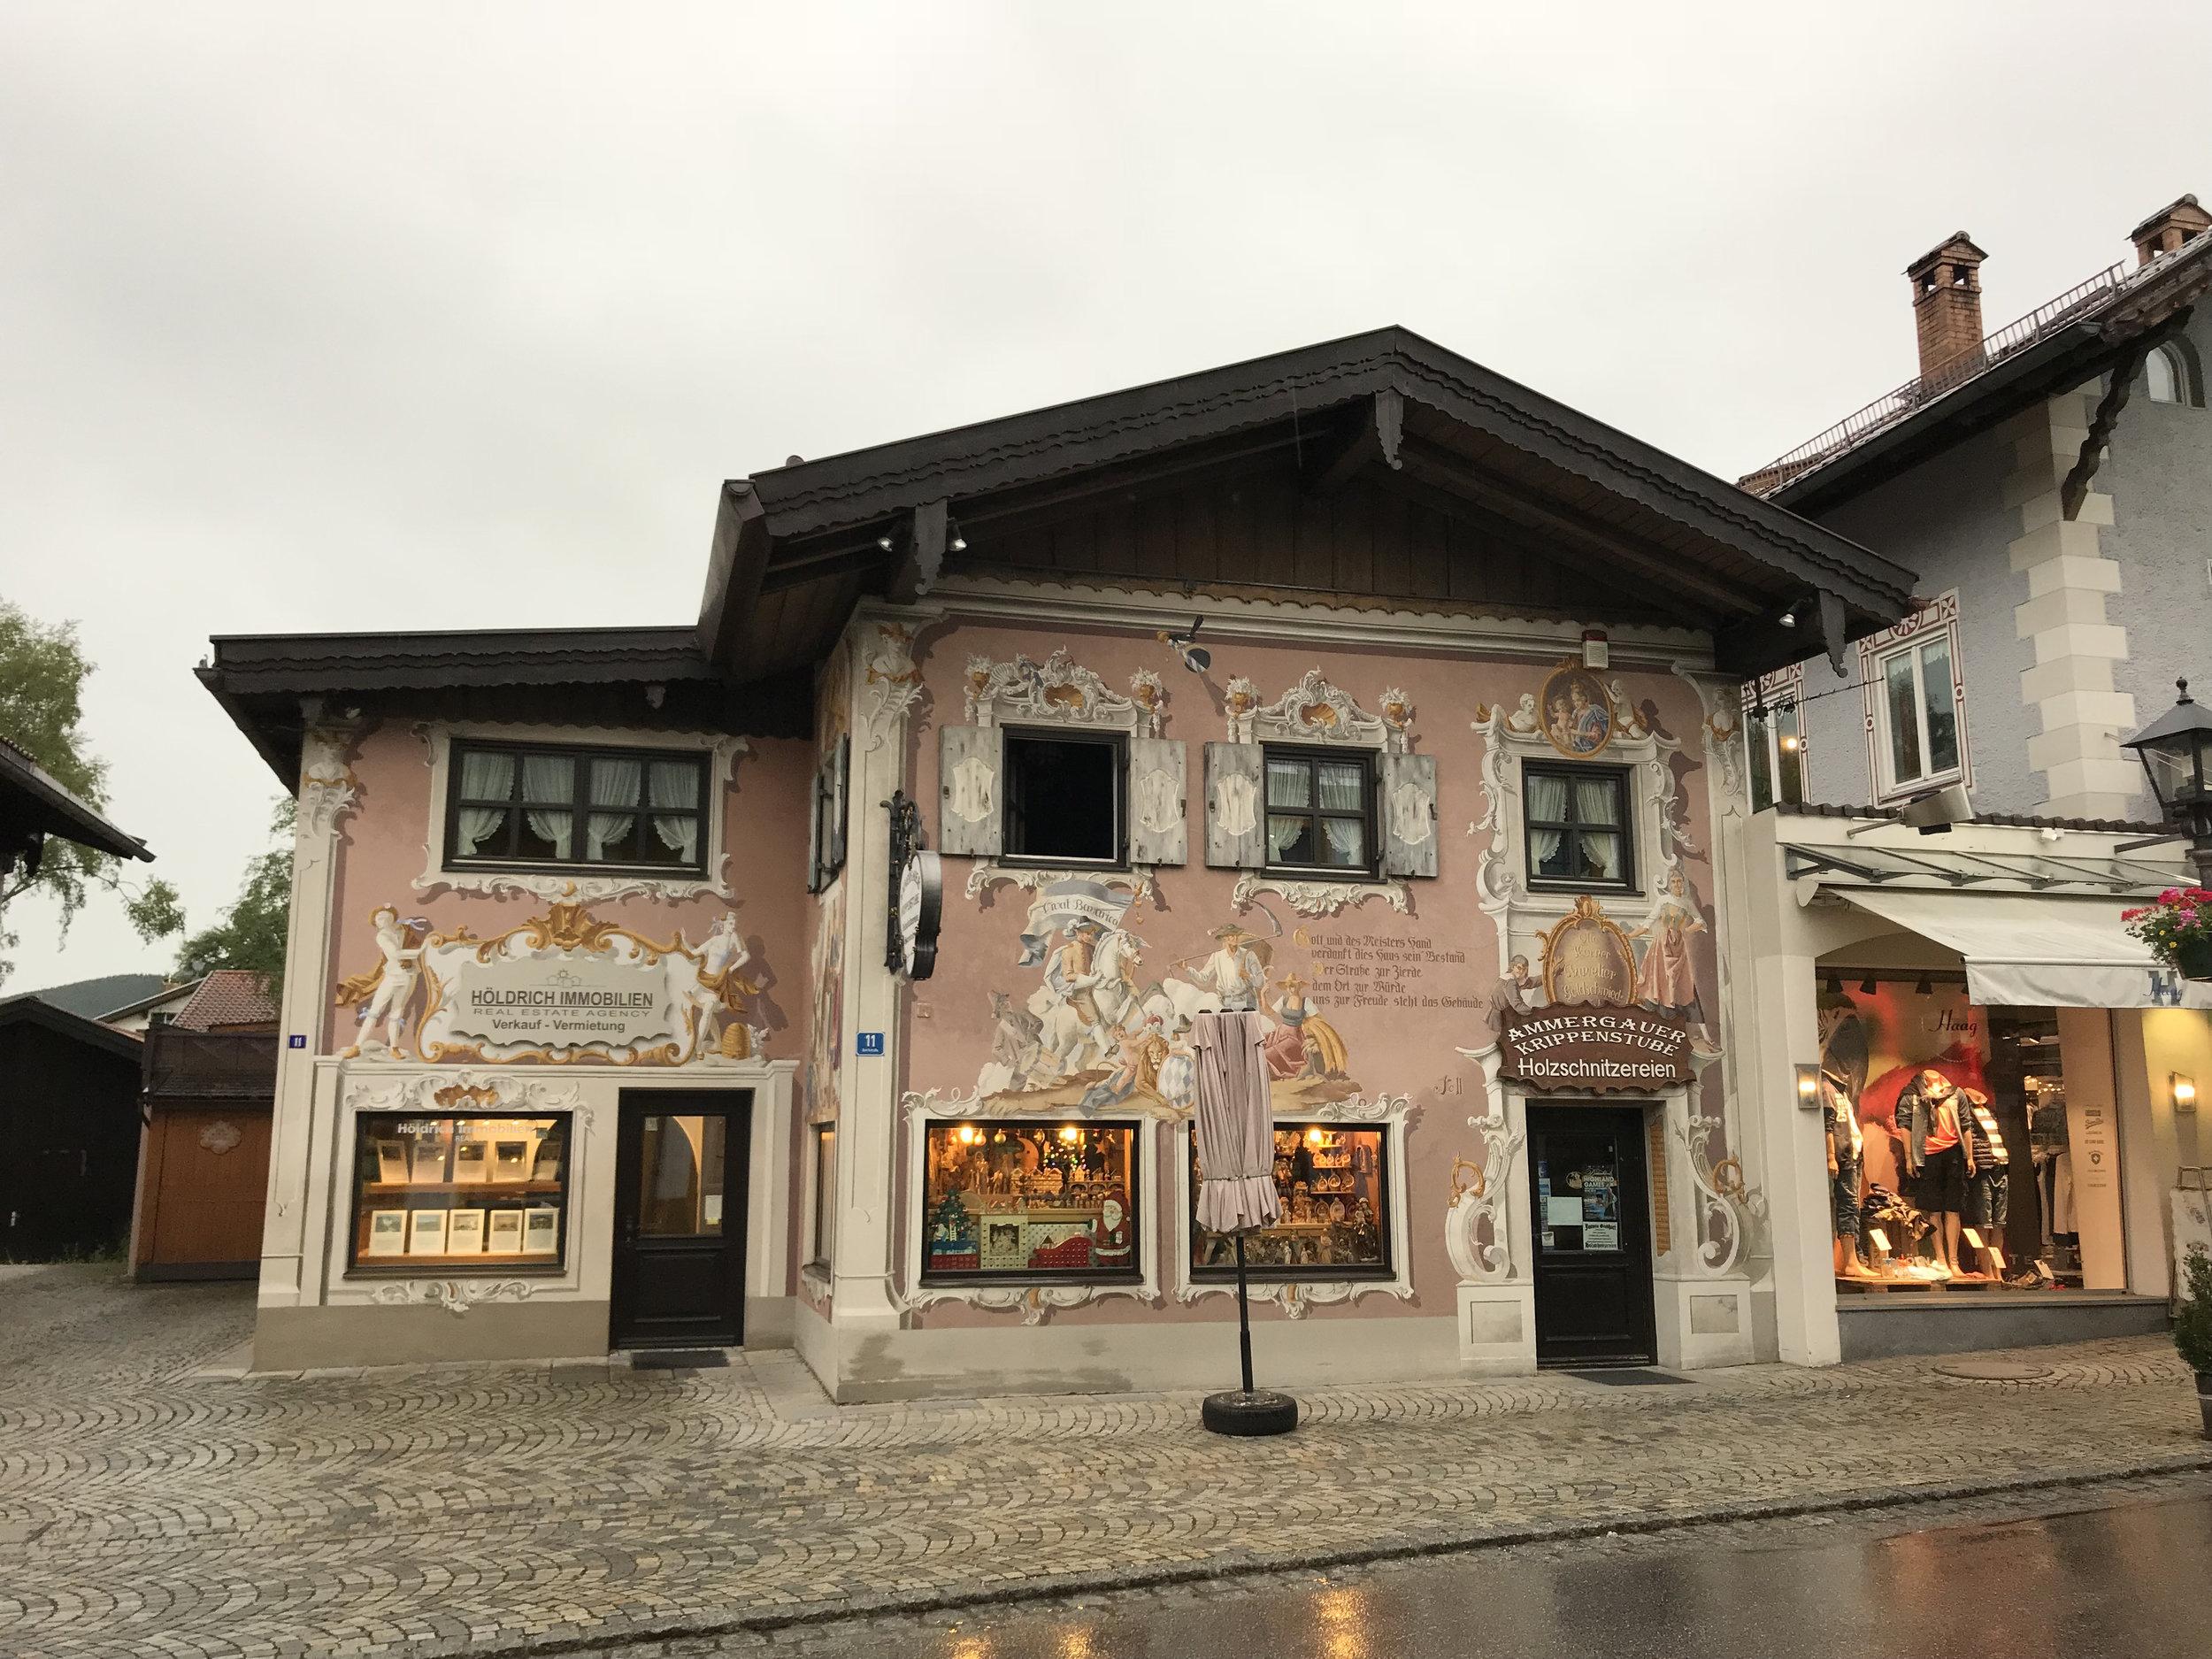 Teri_Bavaria_part3_oberammegau_spiritedtable_photo02.jpg